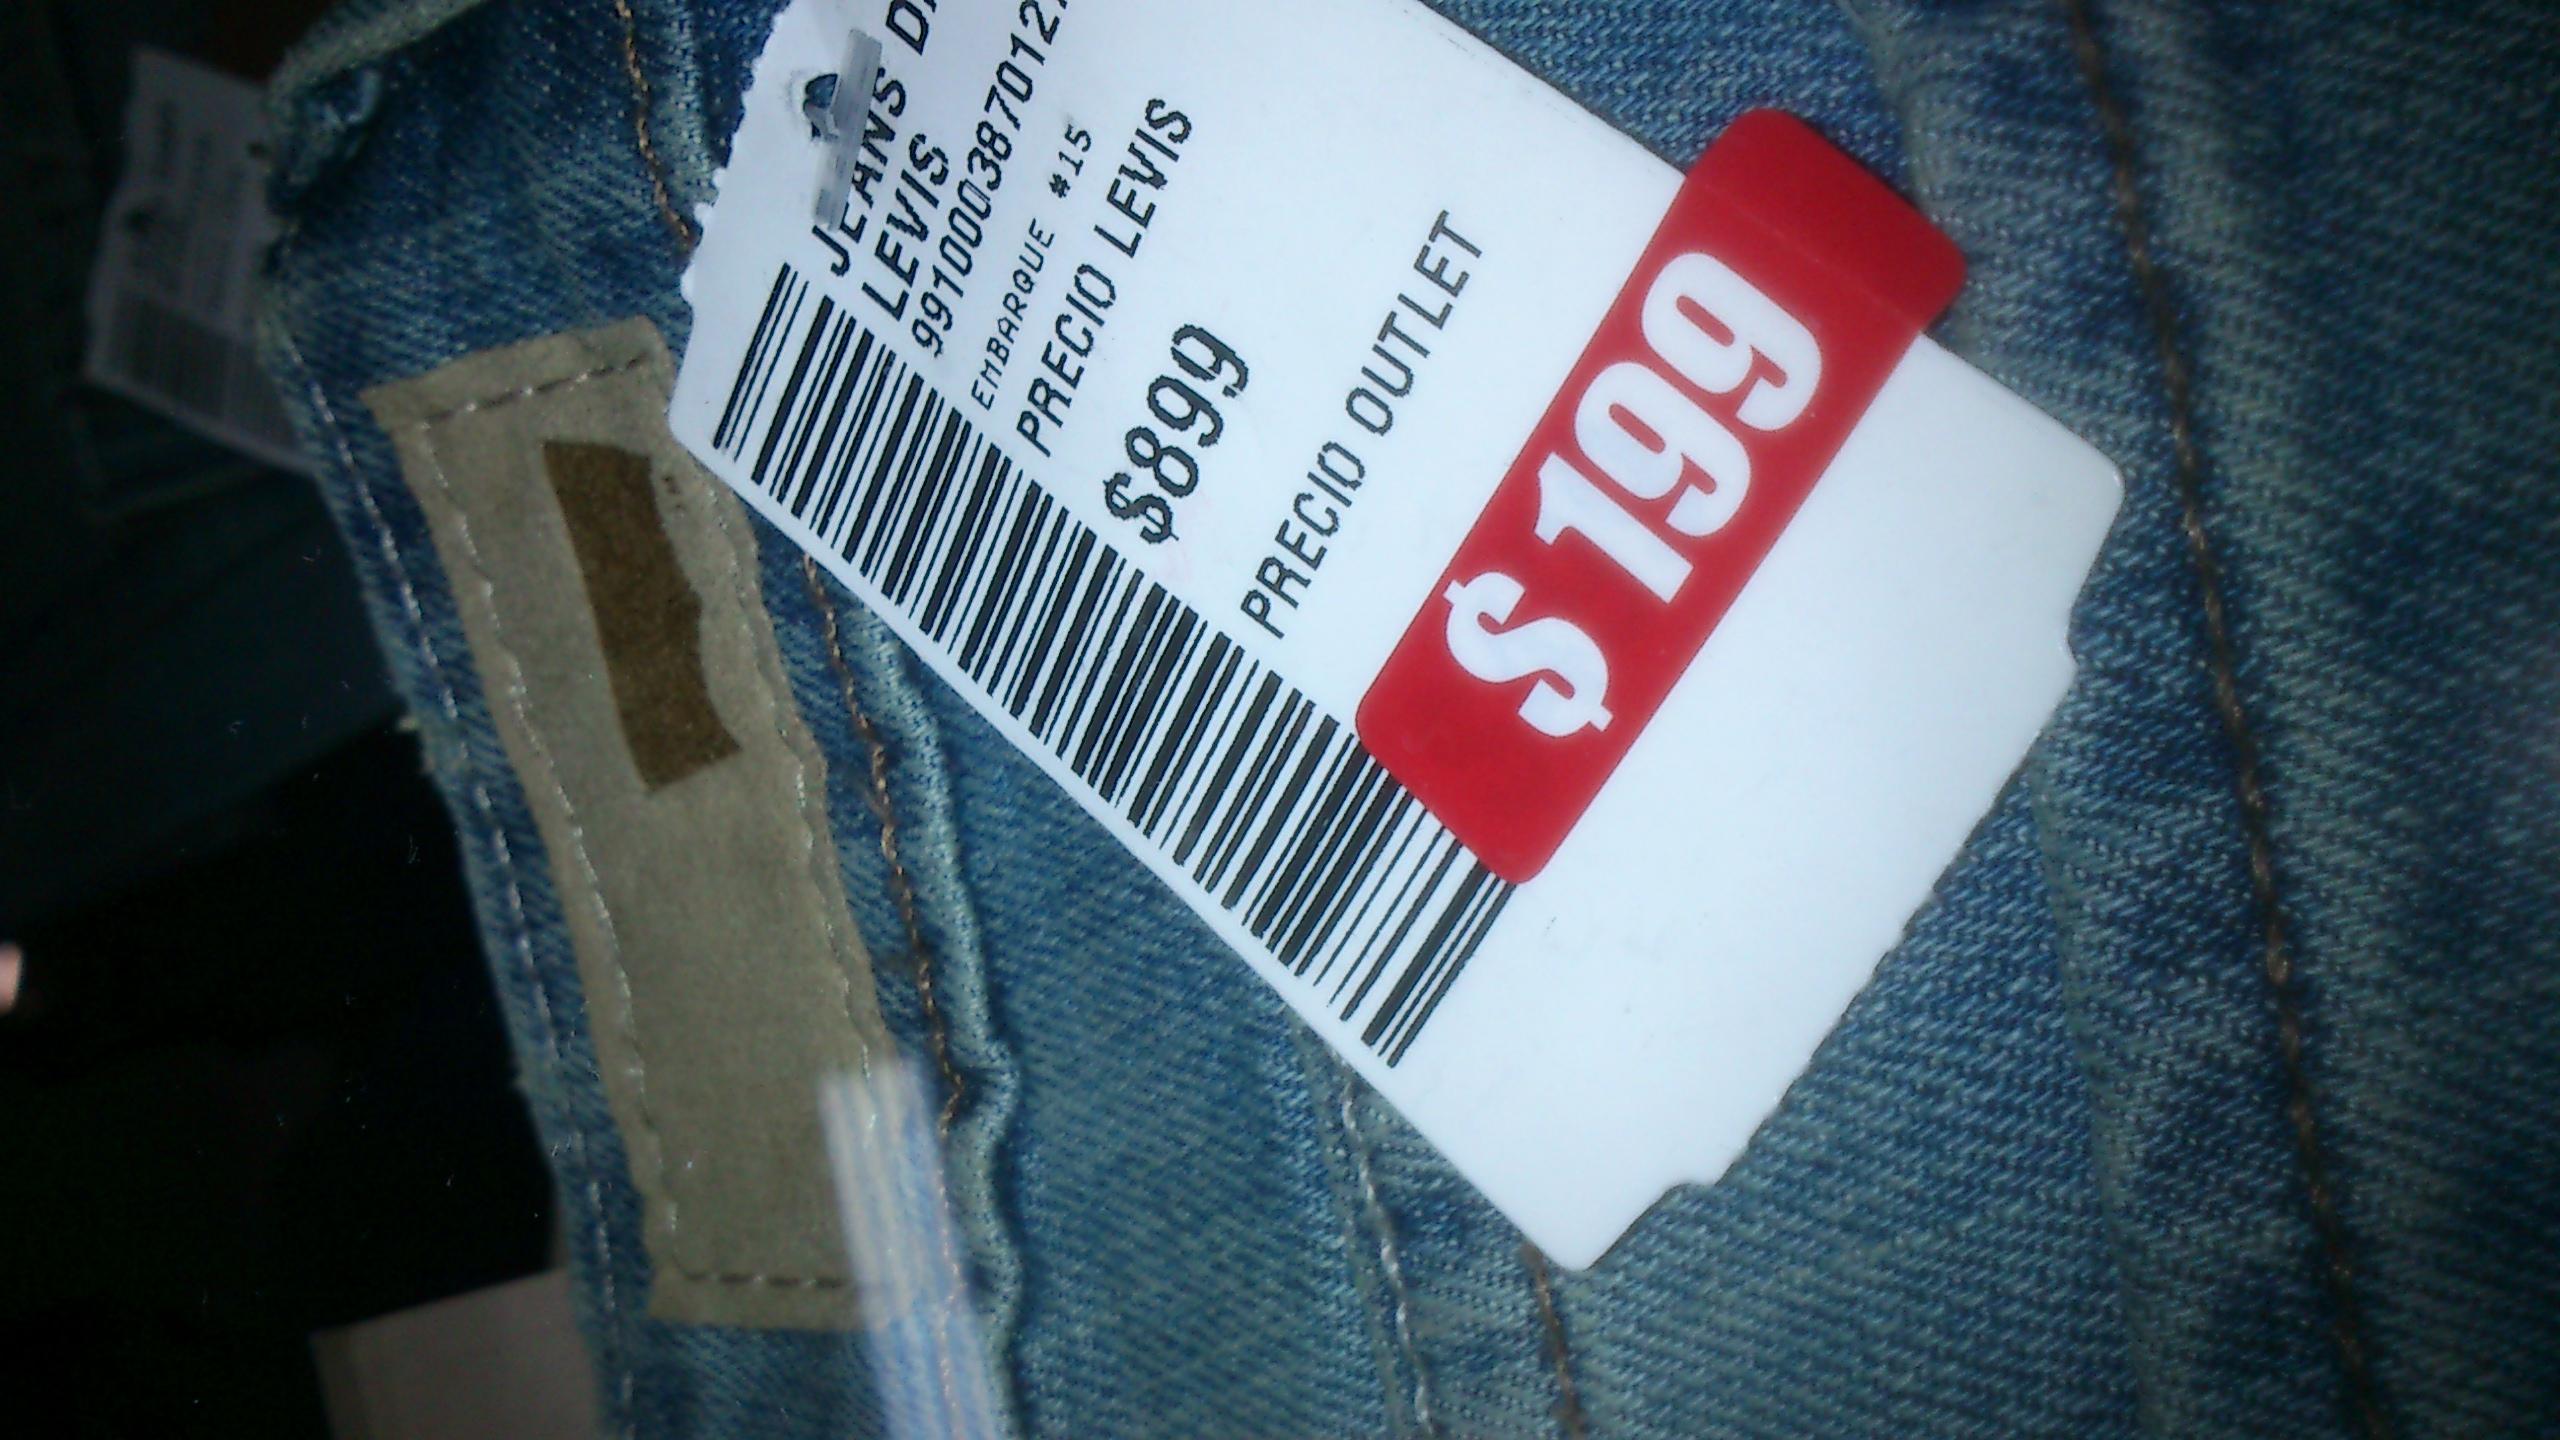 Promoda Outlet: Jeans Levi's desde $199